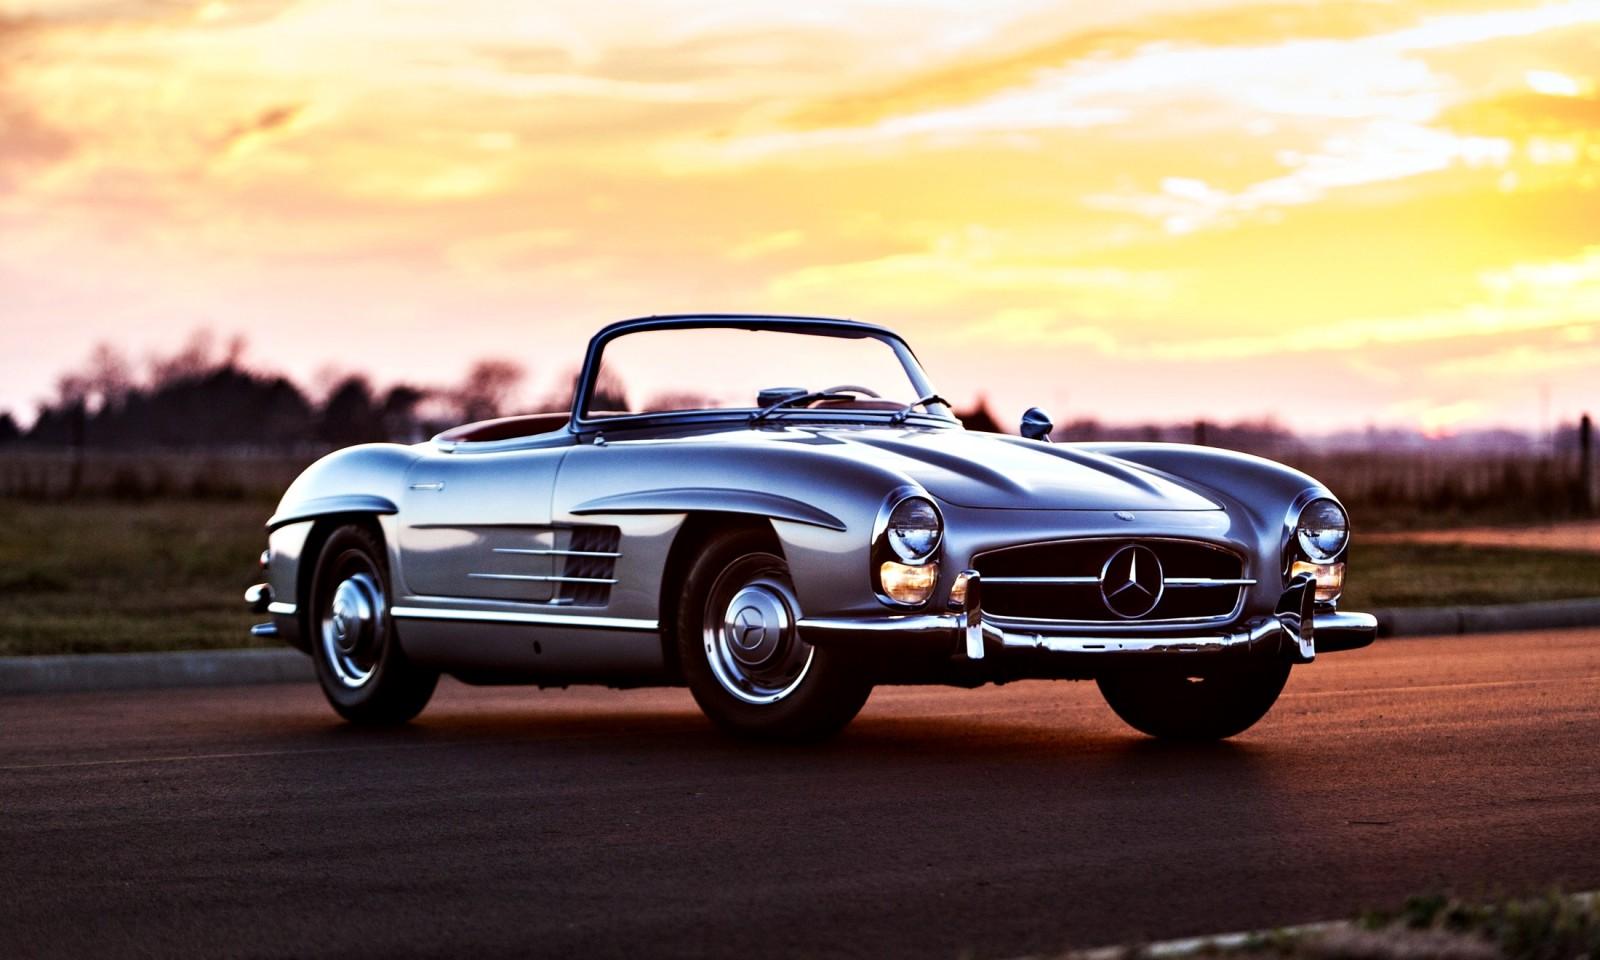 2020 mercedes benz sl pure concept by matthias b ttcher for Mercedes benz sl